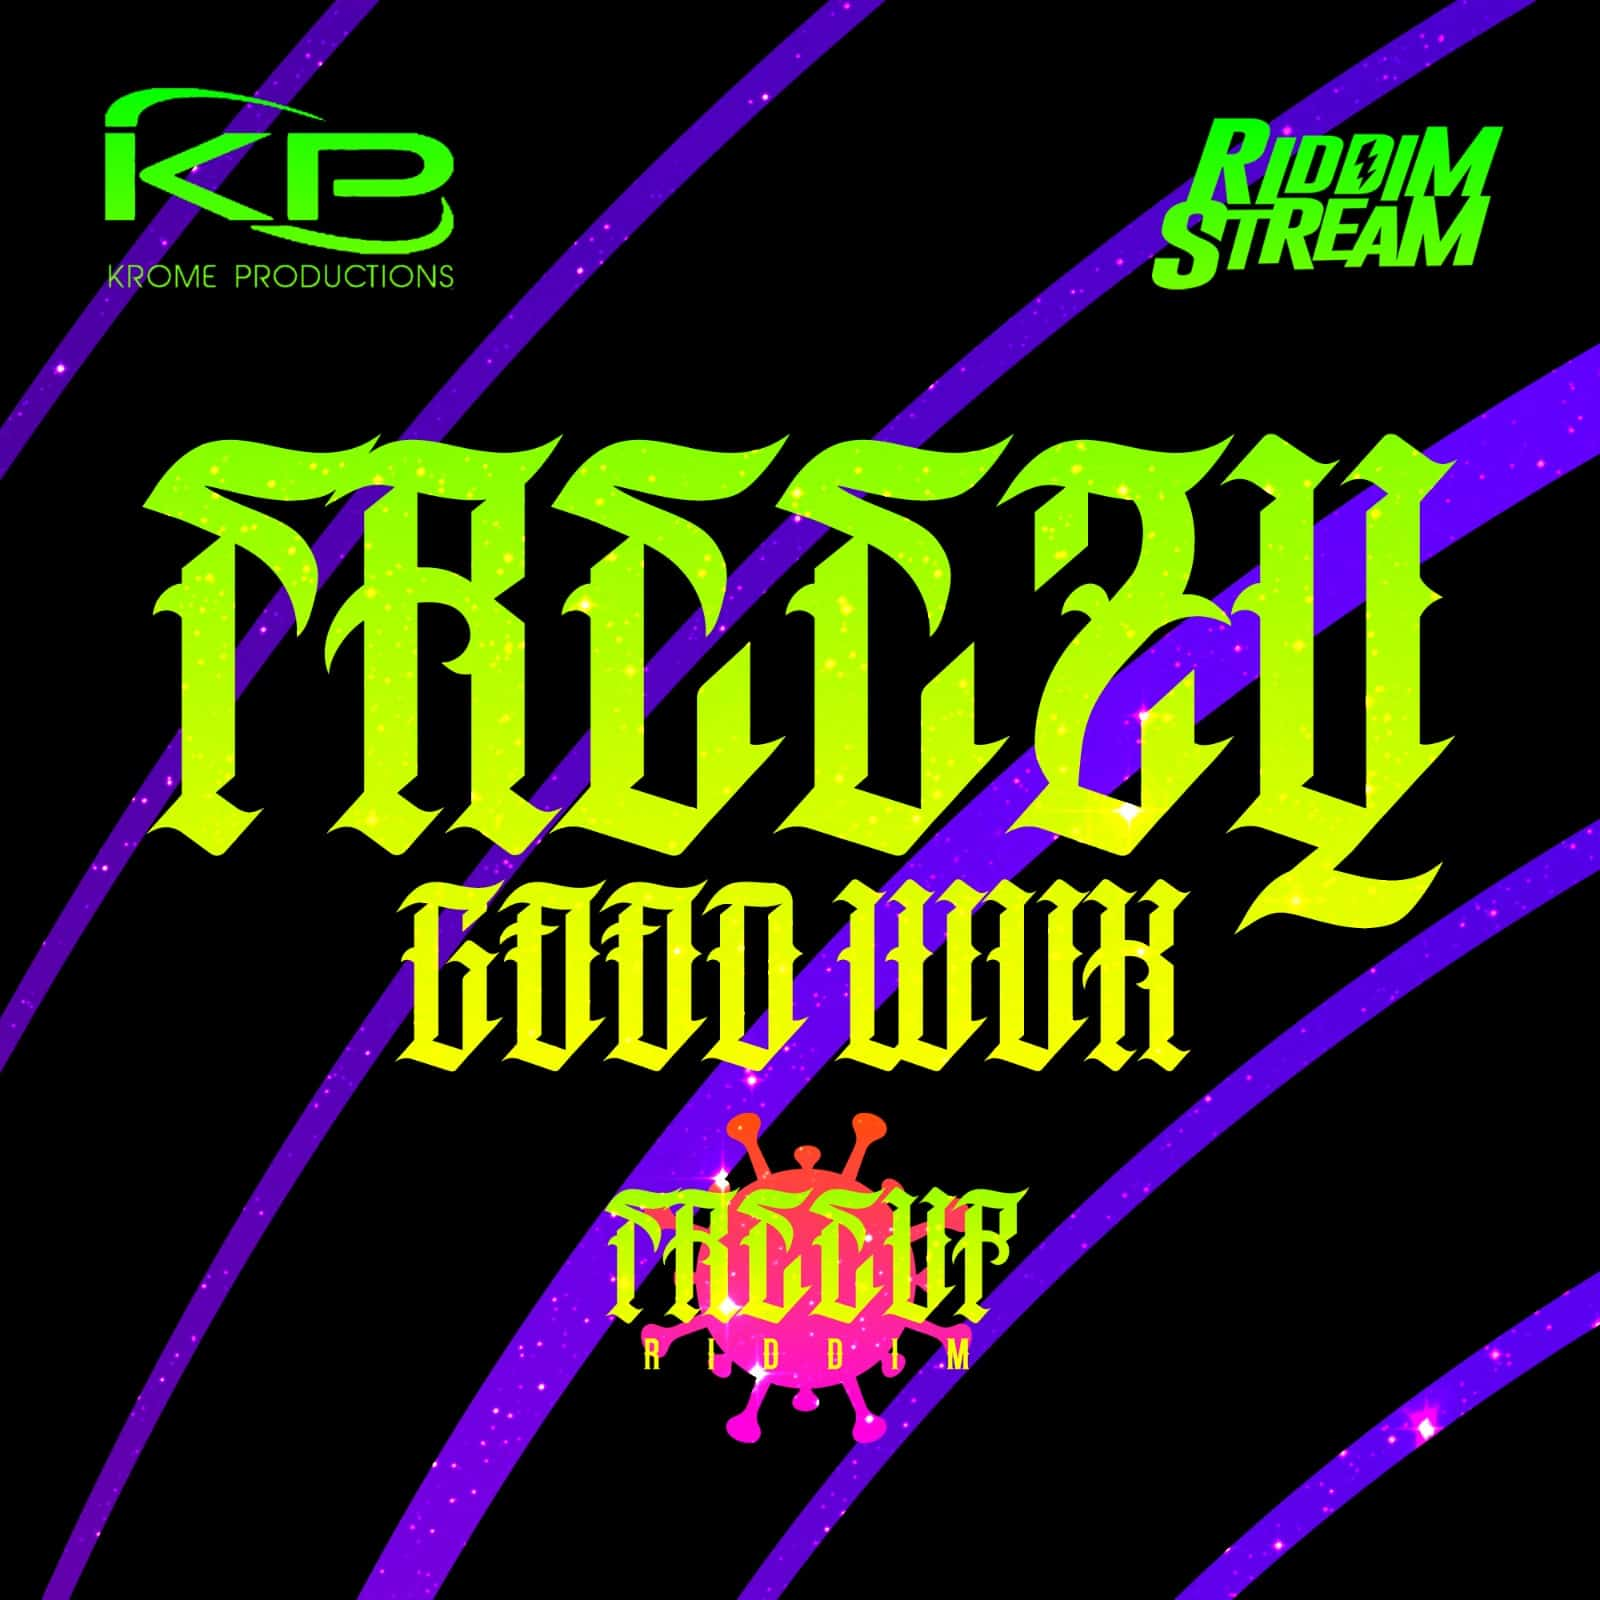 Freezy - Good Wuk - Freeup Riddim